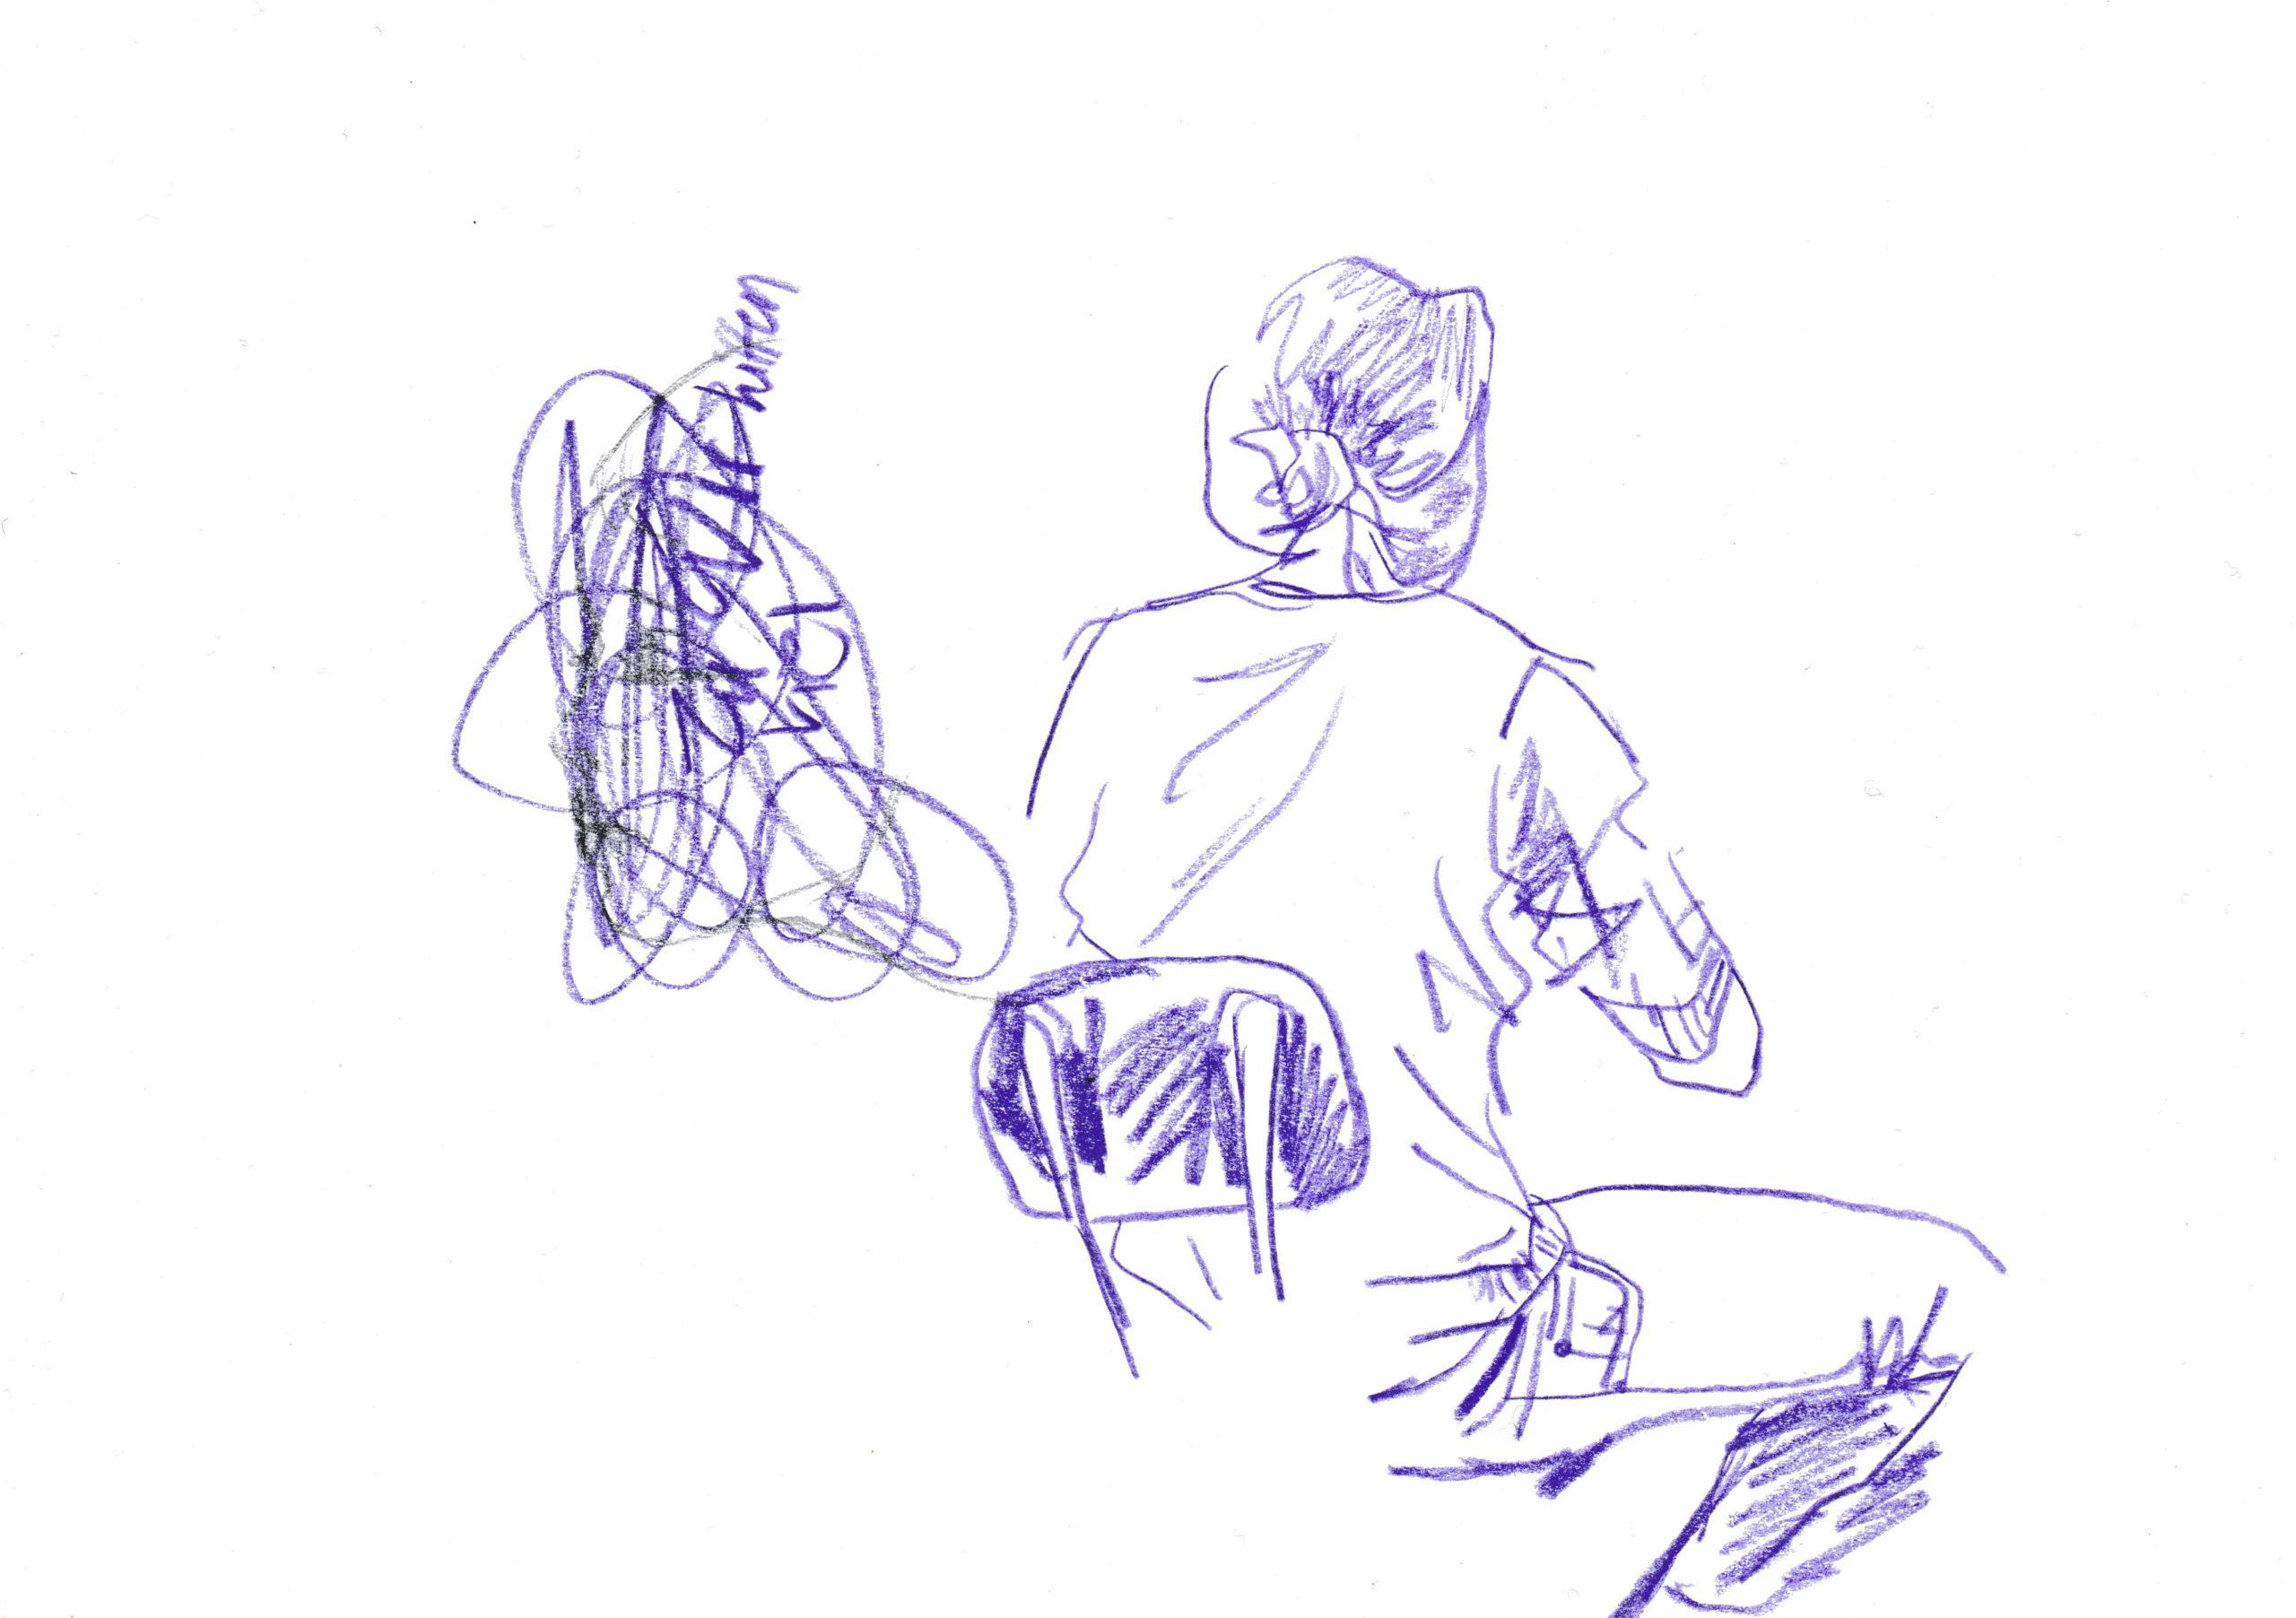 Farbstift auf Papier,DIN A5 , 2020, Melissa Hermann